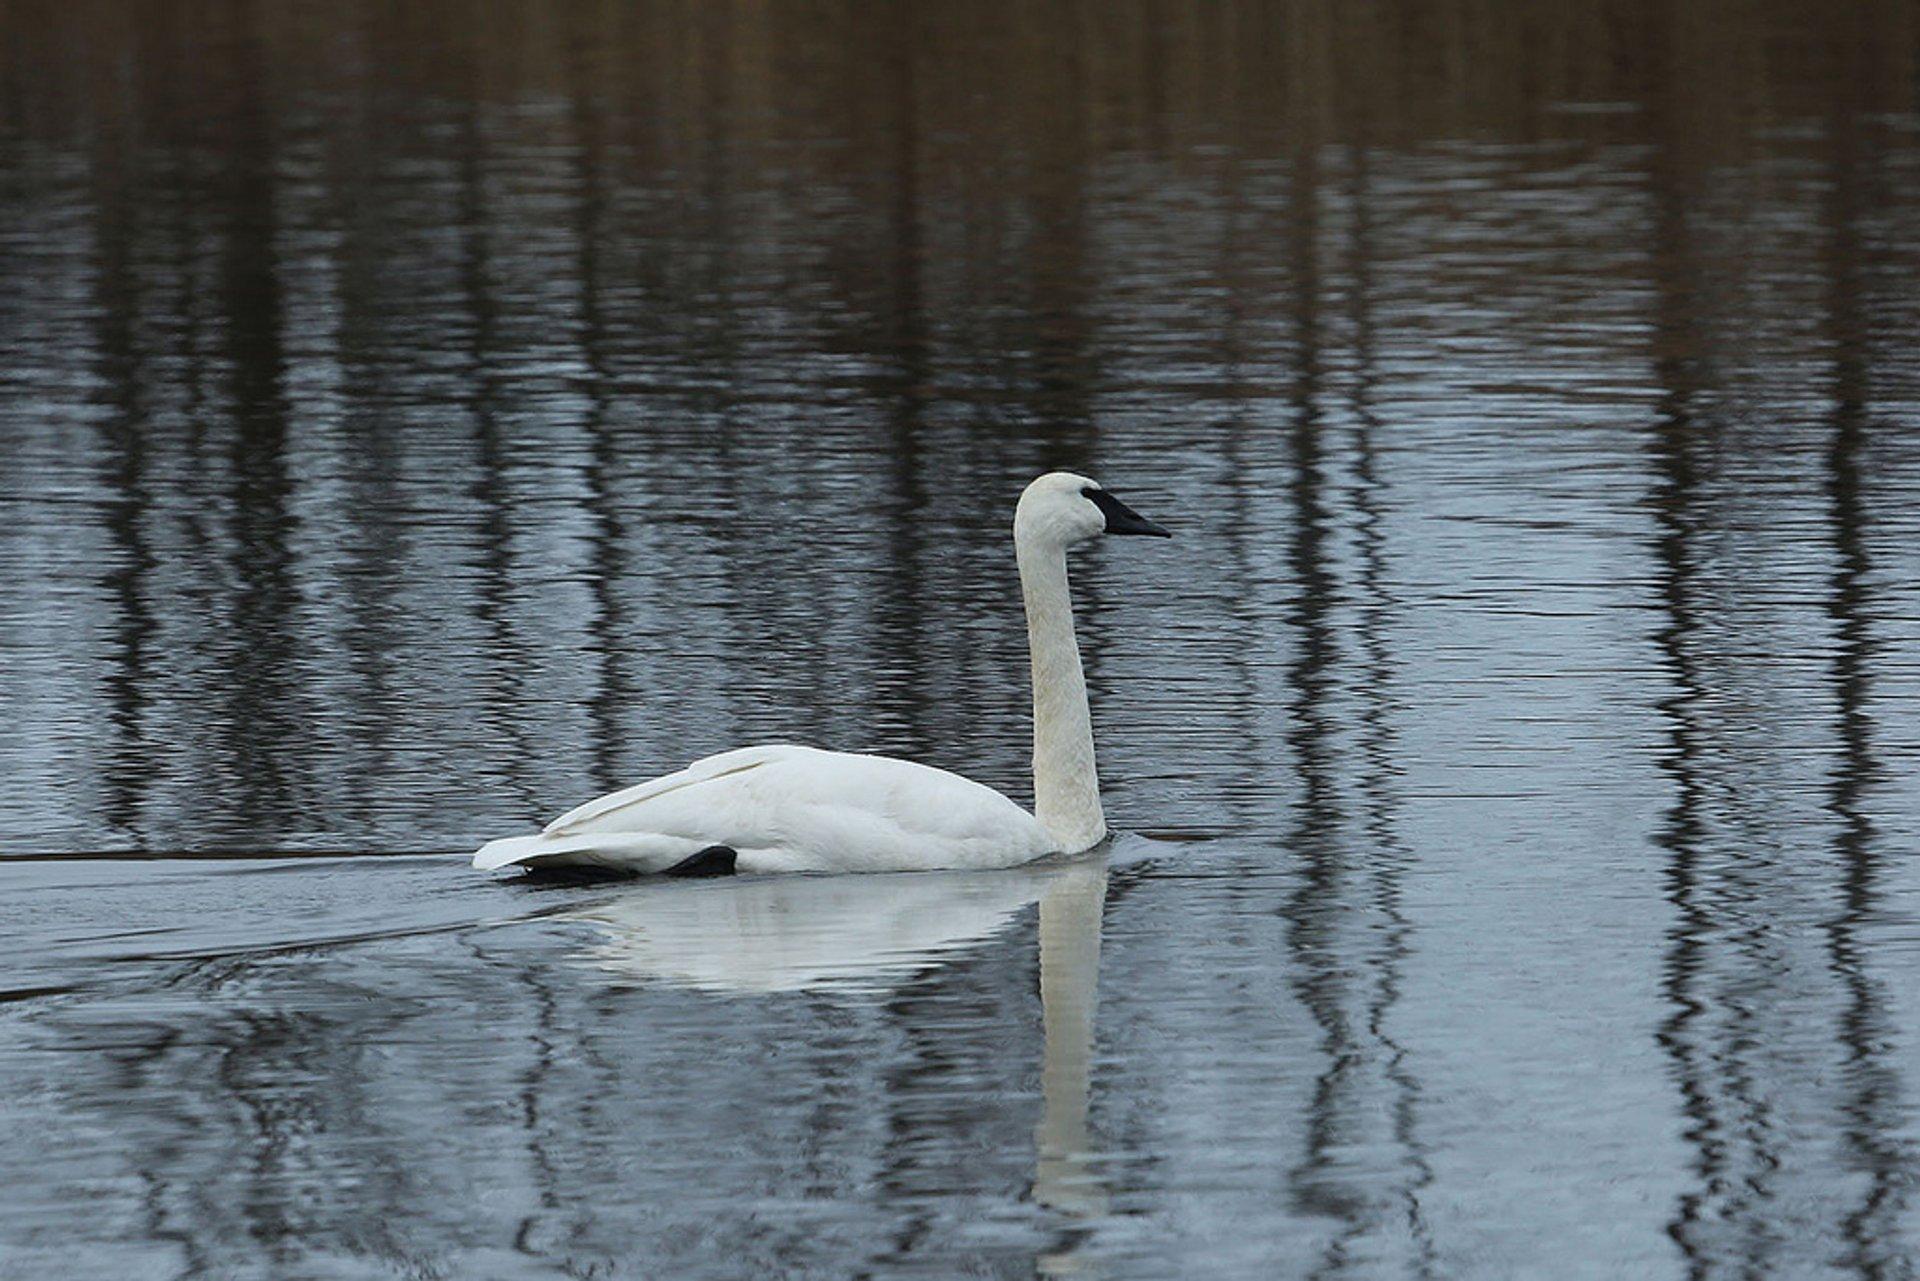 Wild Trumpeter Swans on the Olympic Peninsula, Washington 2020